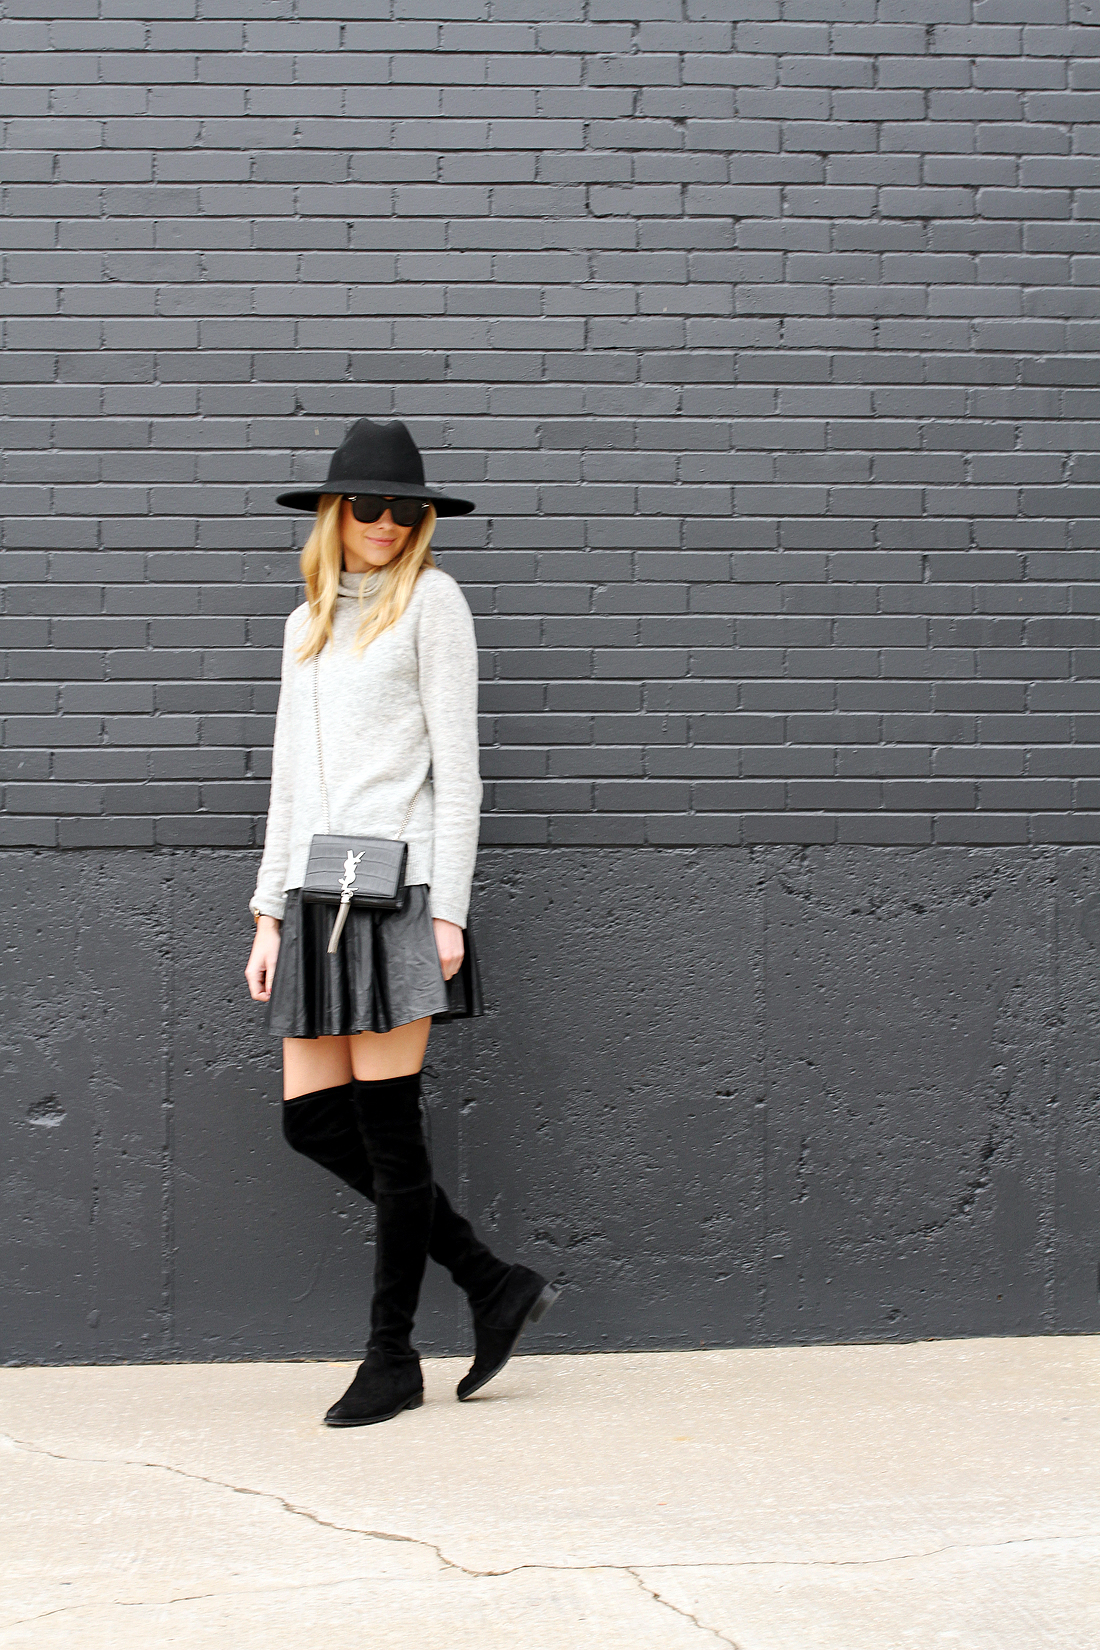 fashion-jackson-grey-sweater-black-pleated-skirt-black-otk-boots-black-wool-hat-ysl-monogram-crossbody